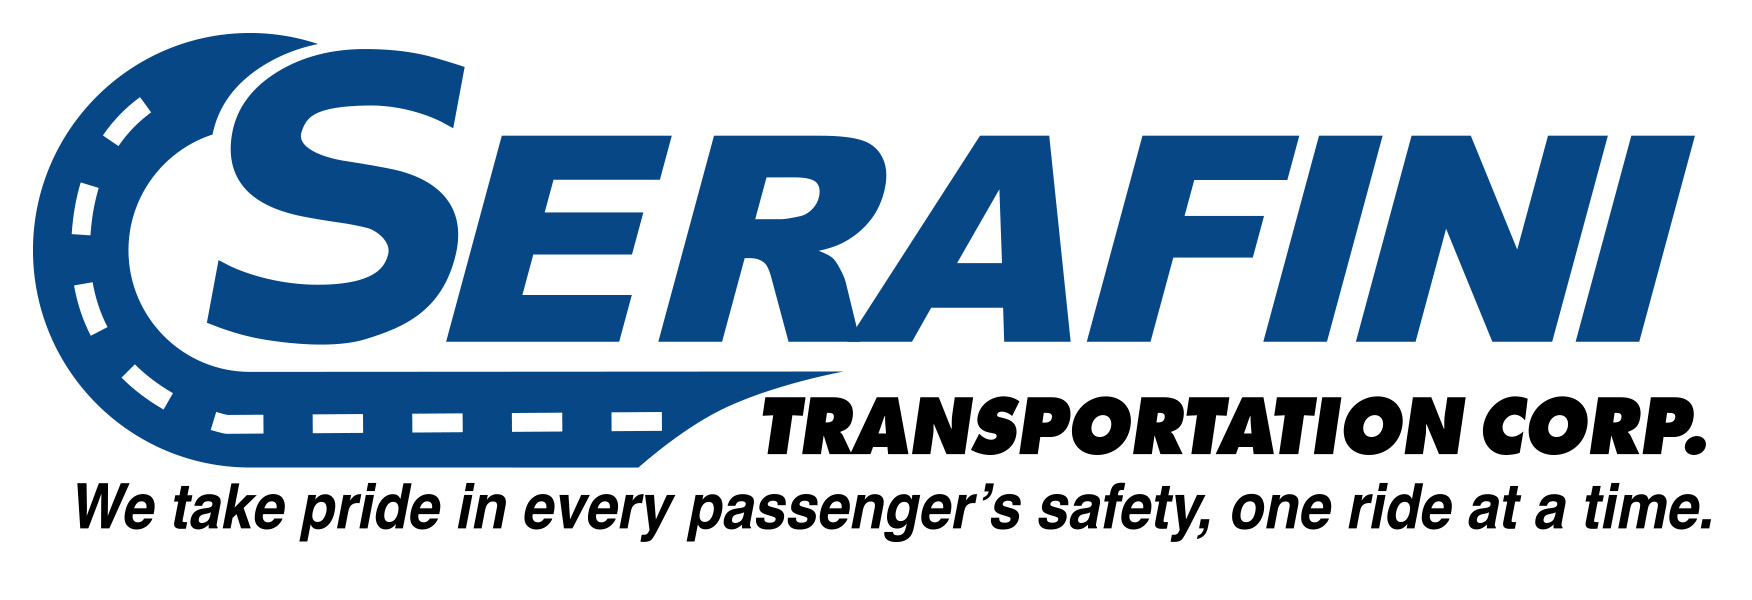 Serafini Transportation Corp.